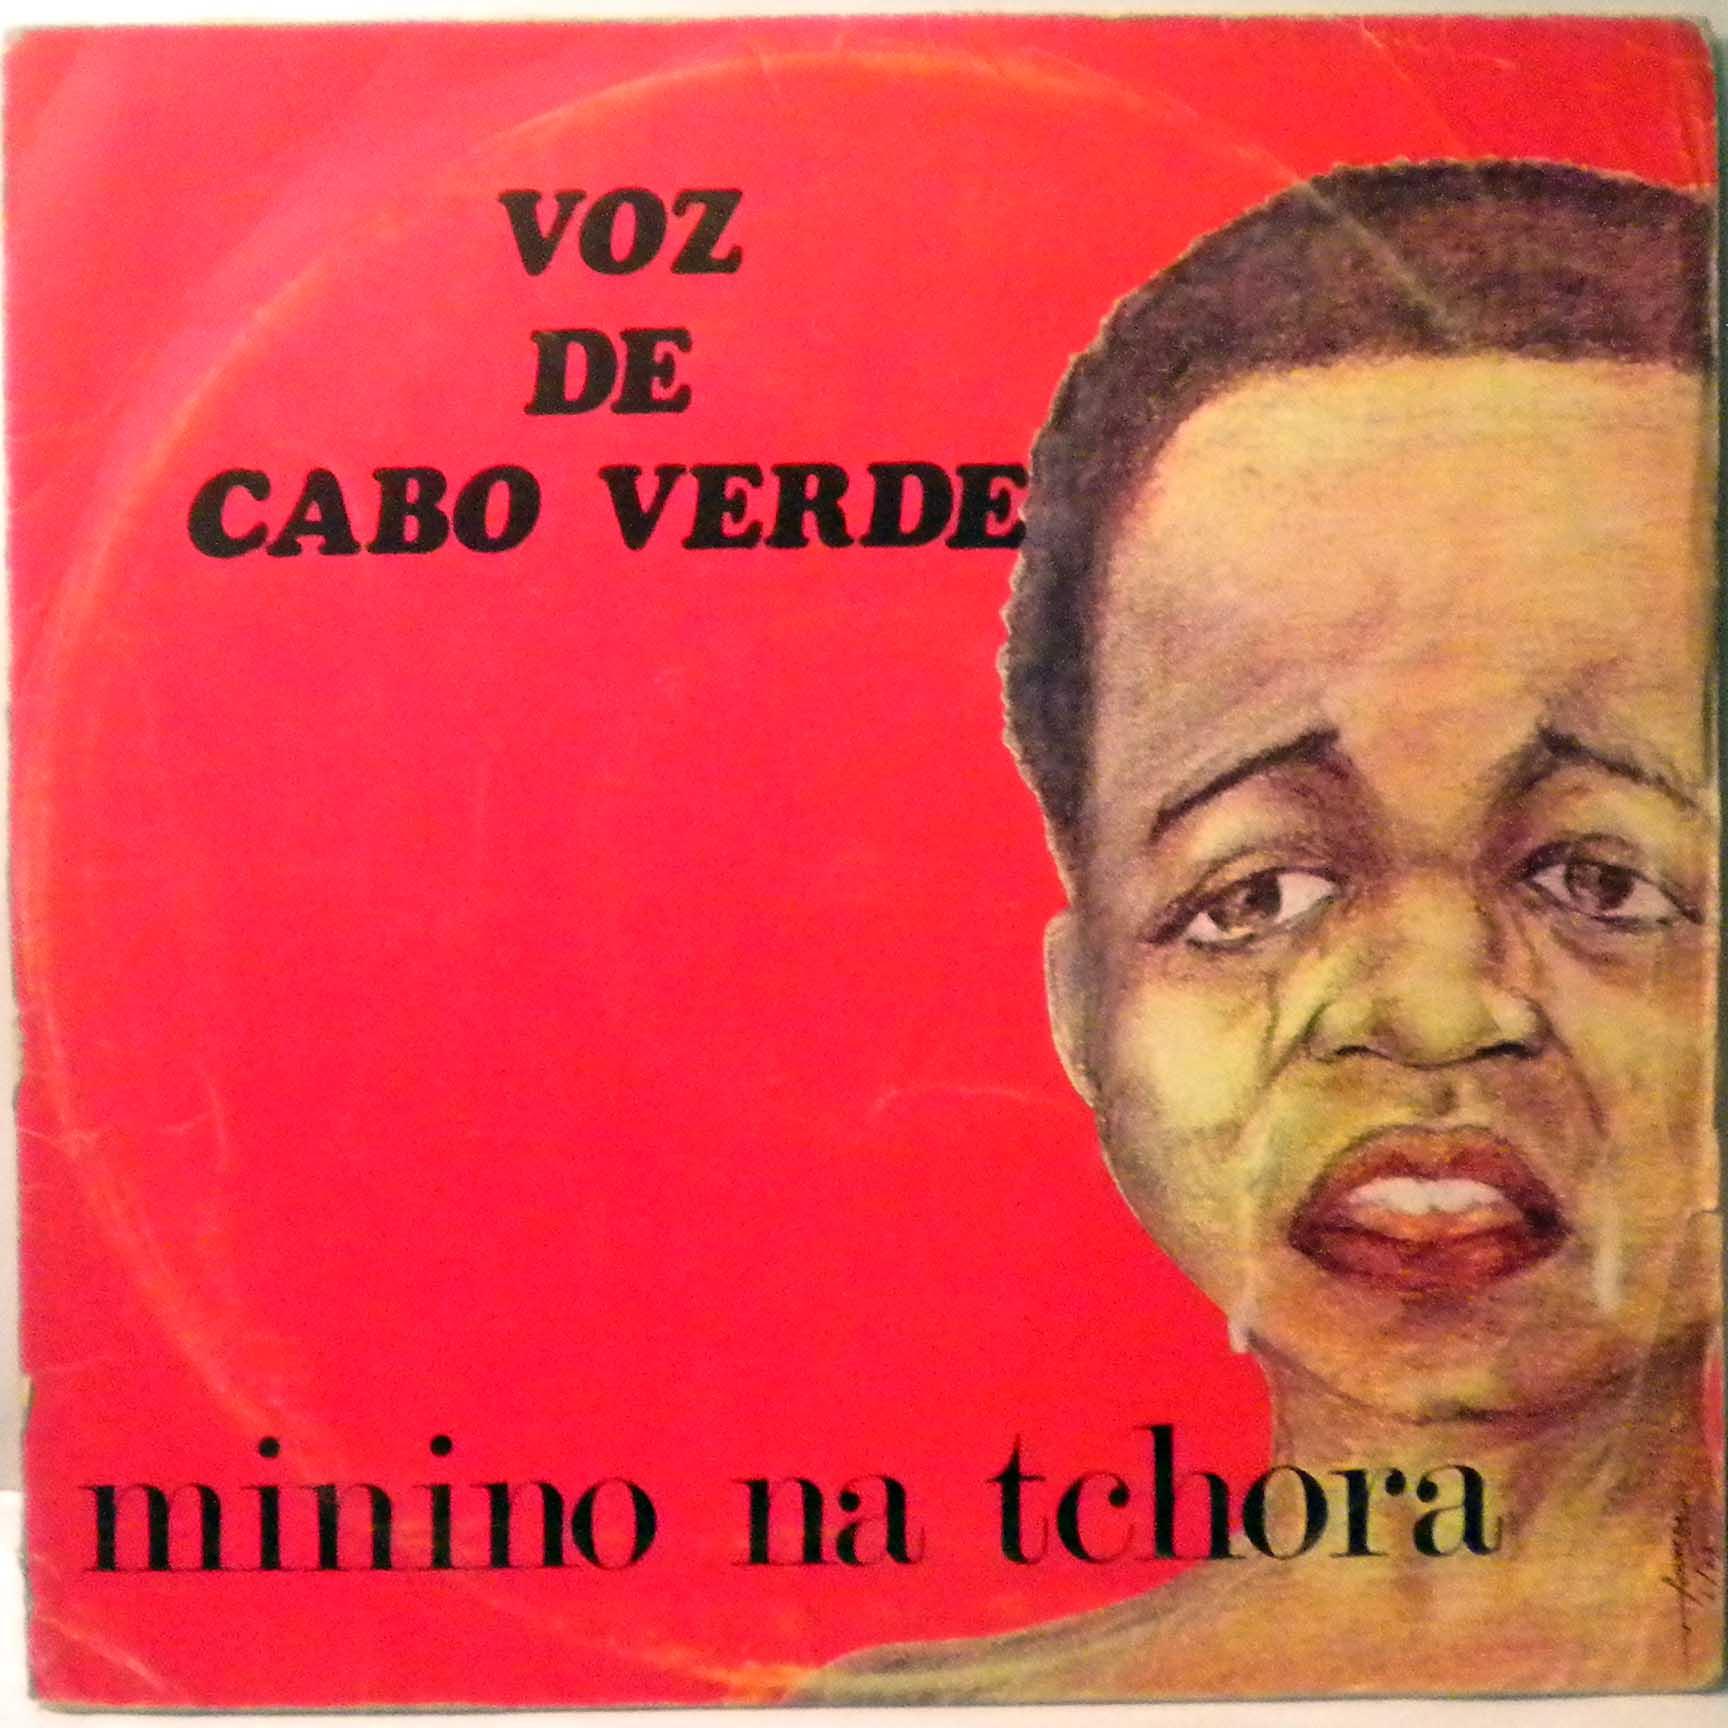 VOZ DE CABO VERDE - Minino na tchora - LP